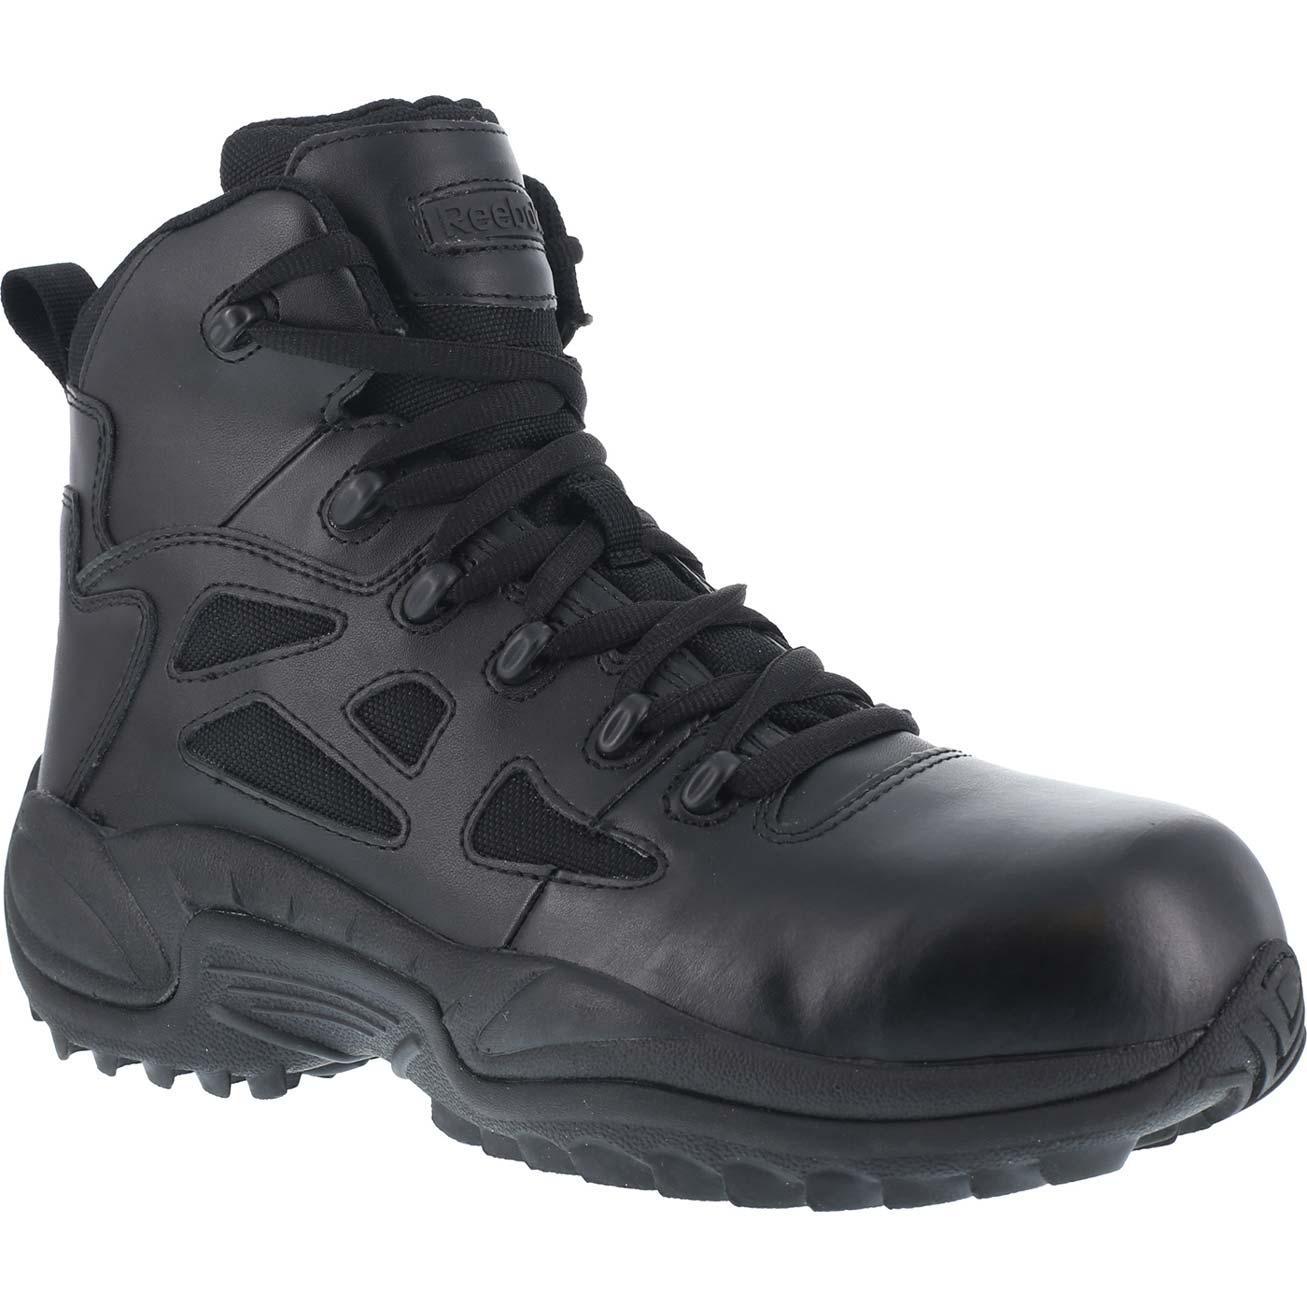 df6d55a84ab Reebok Rapid Response RB Composite Toe Side Zip Duty Shoe